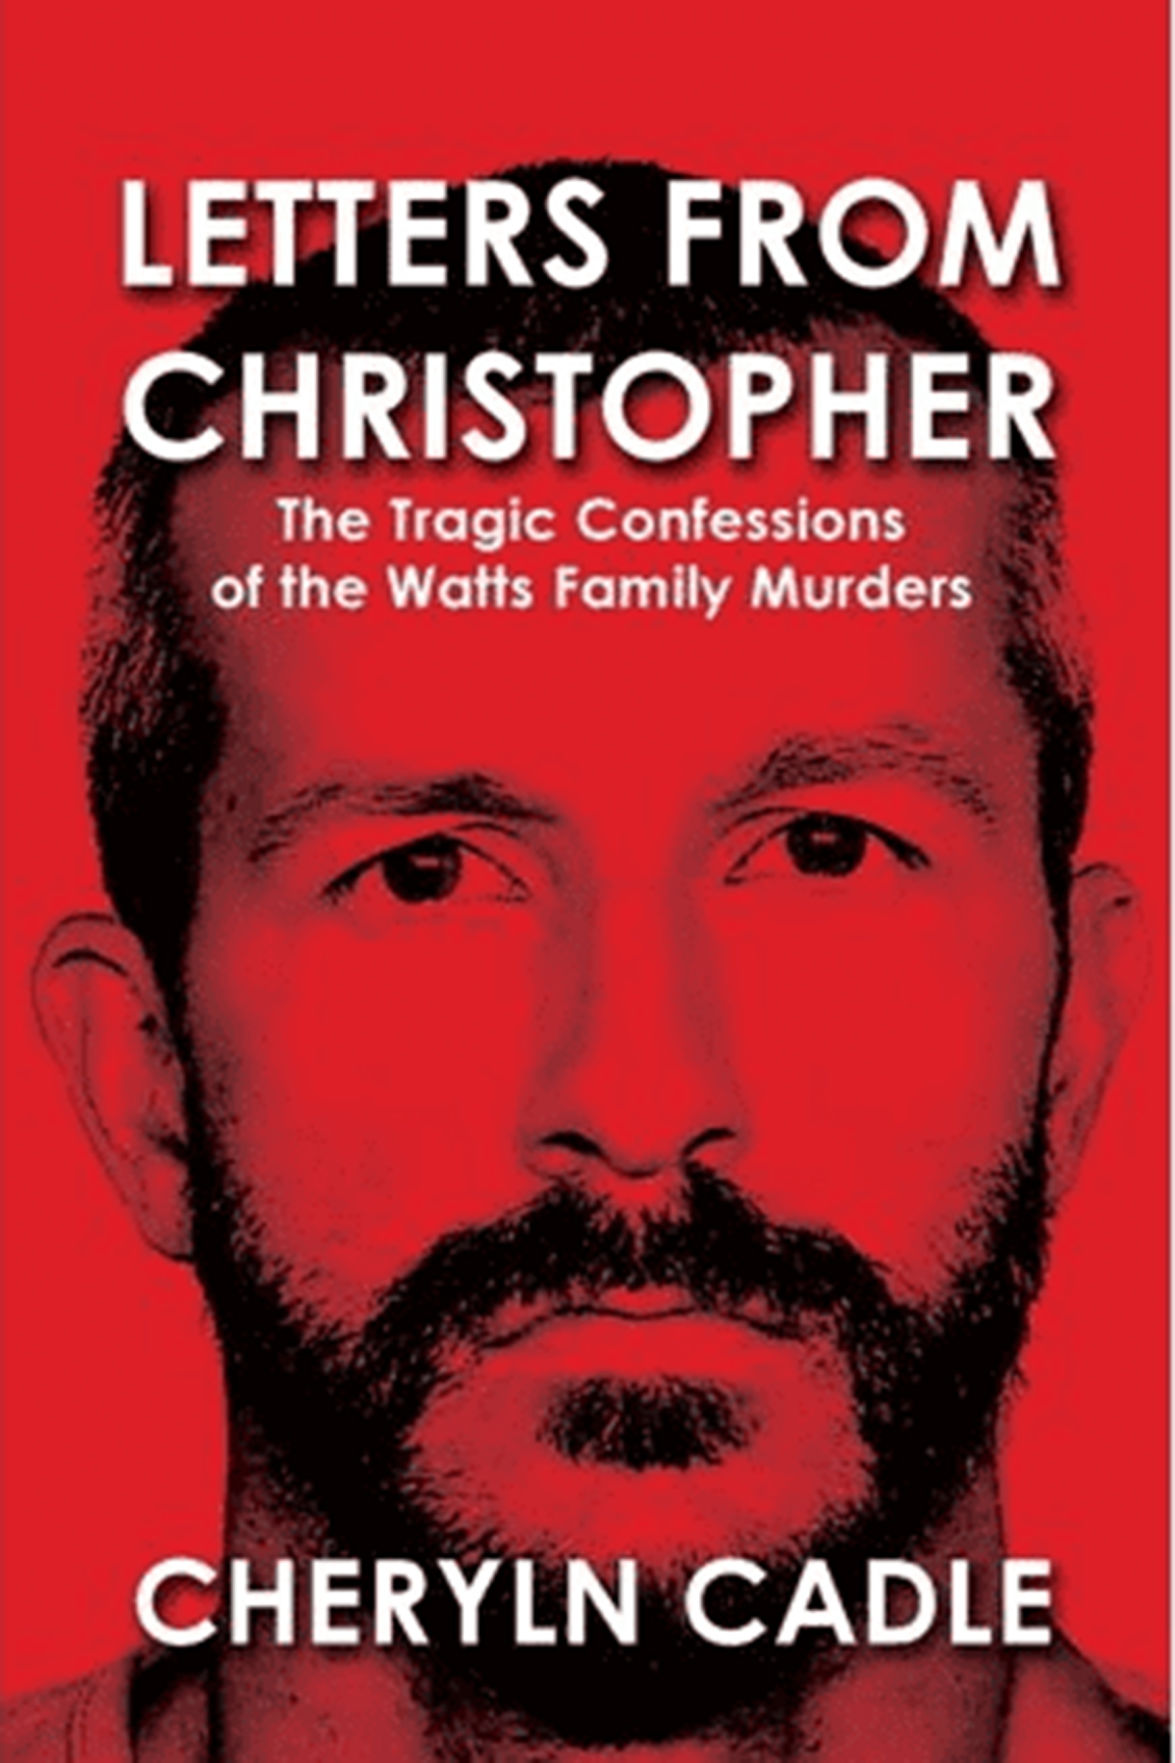 Bourbonnais residents book reveals new details in true crime story